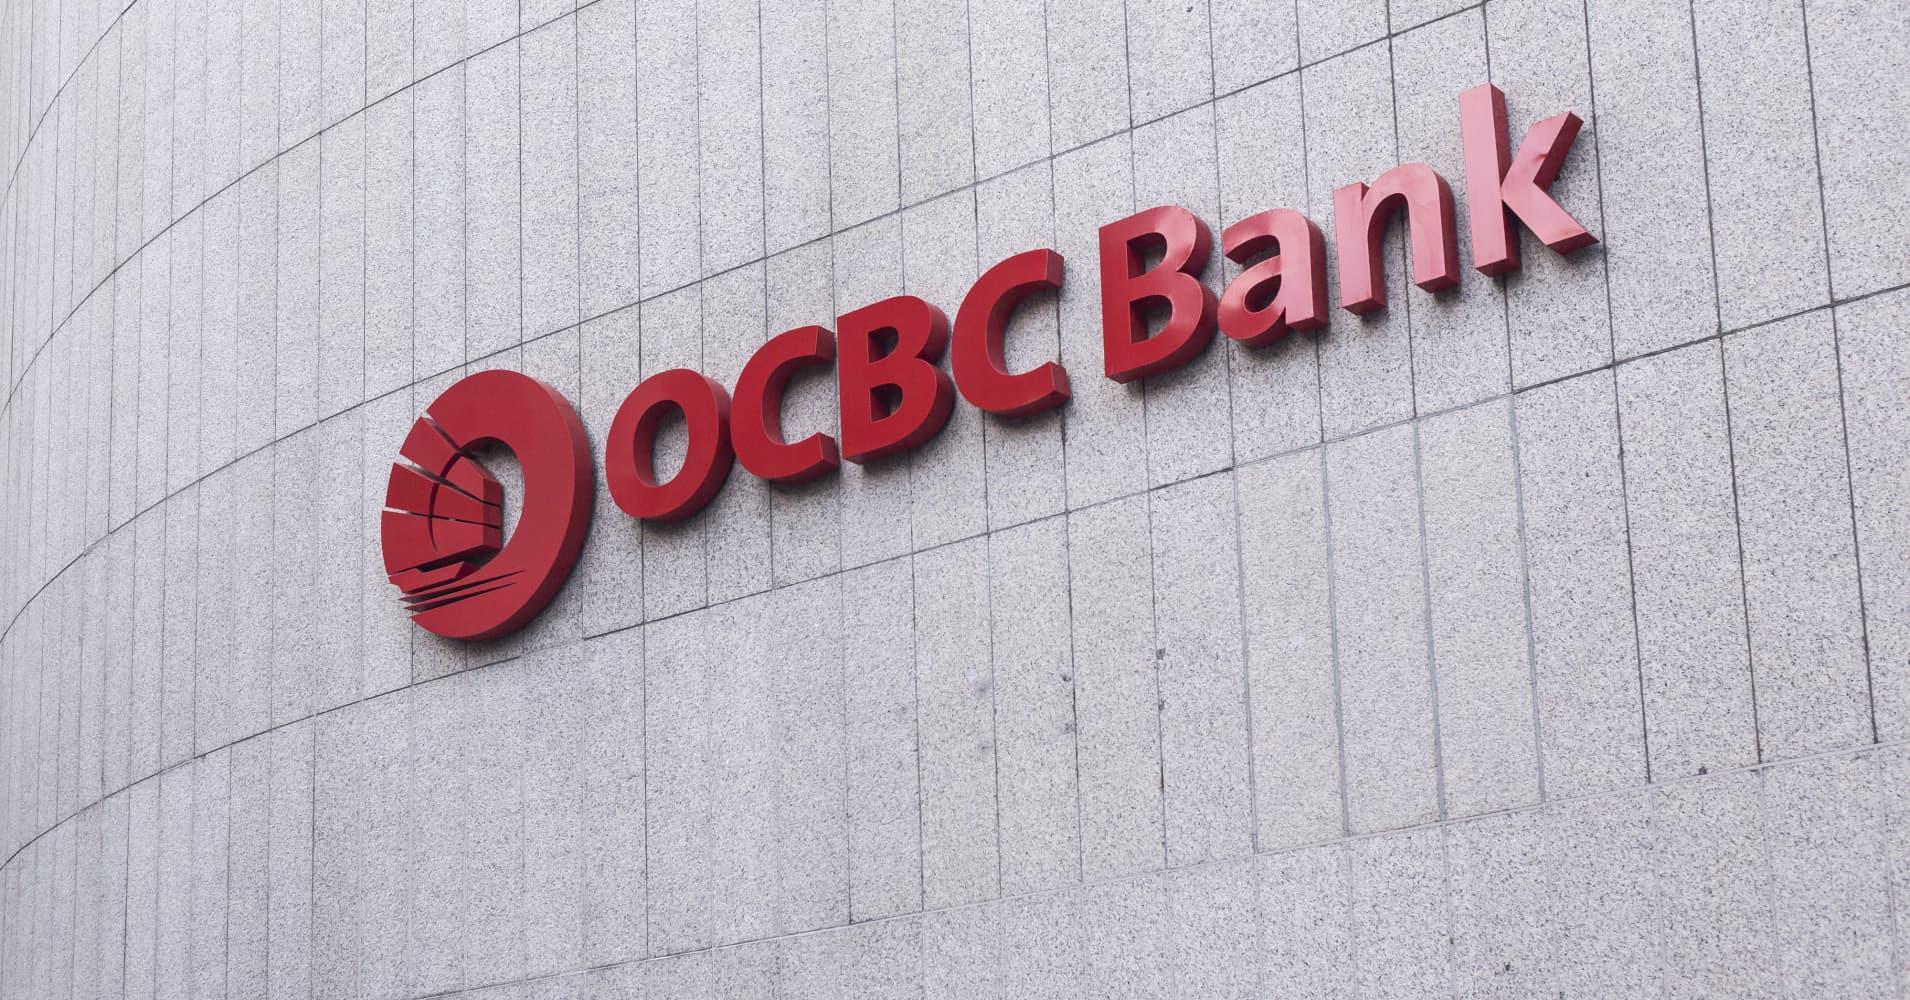 Singapore lender OCBC's quarterly profit falls 10 percent, misses estimates